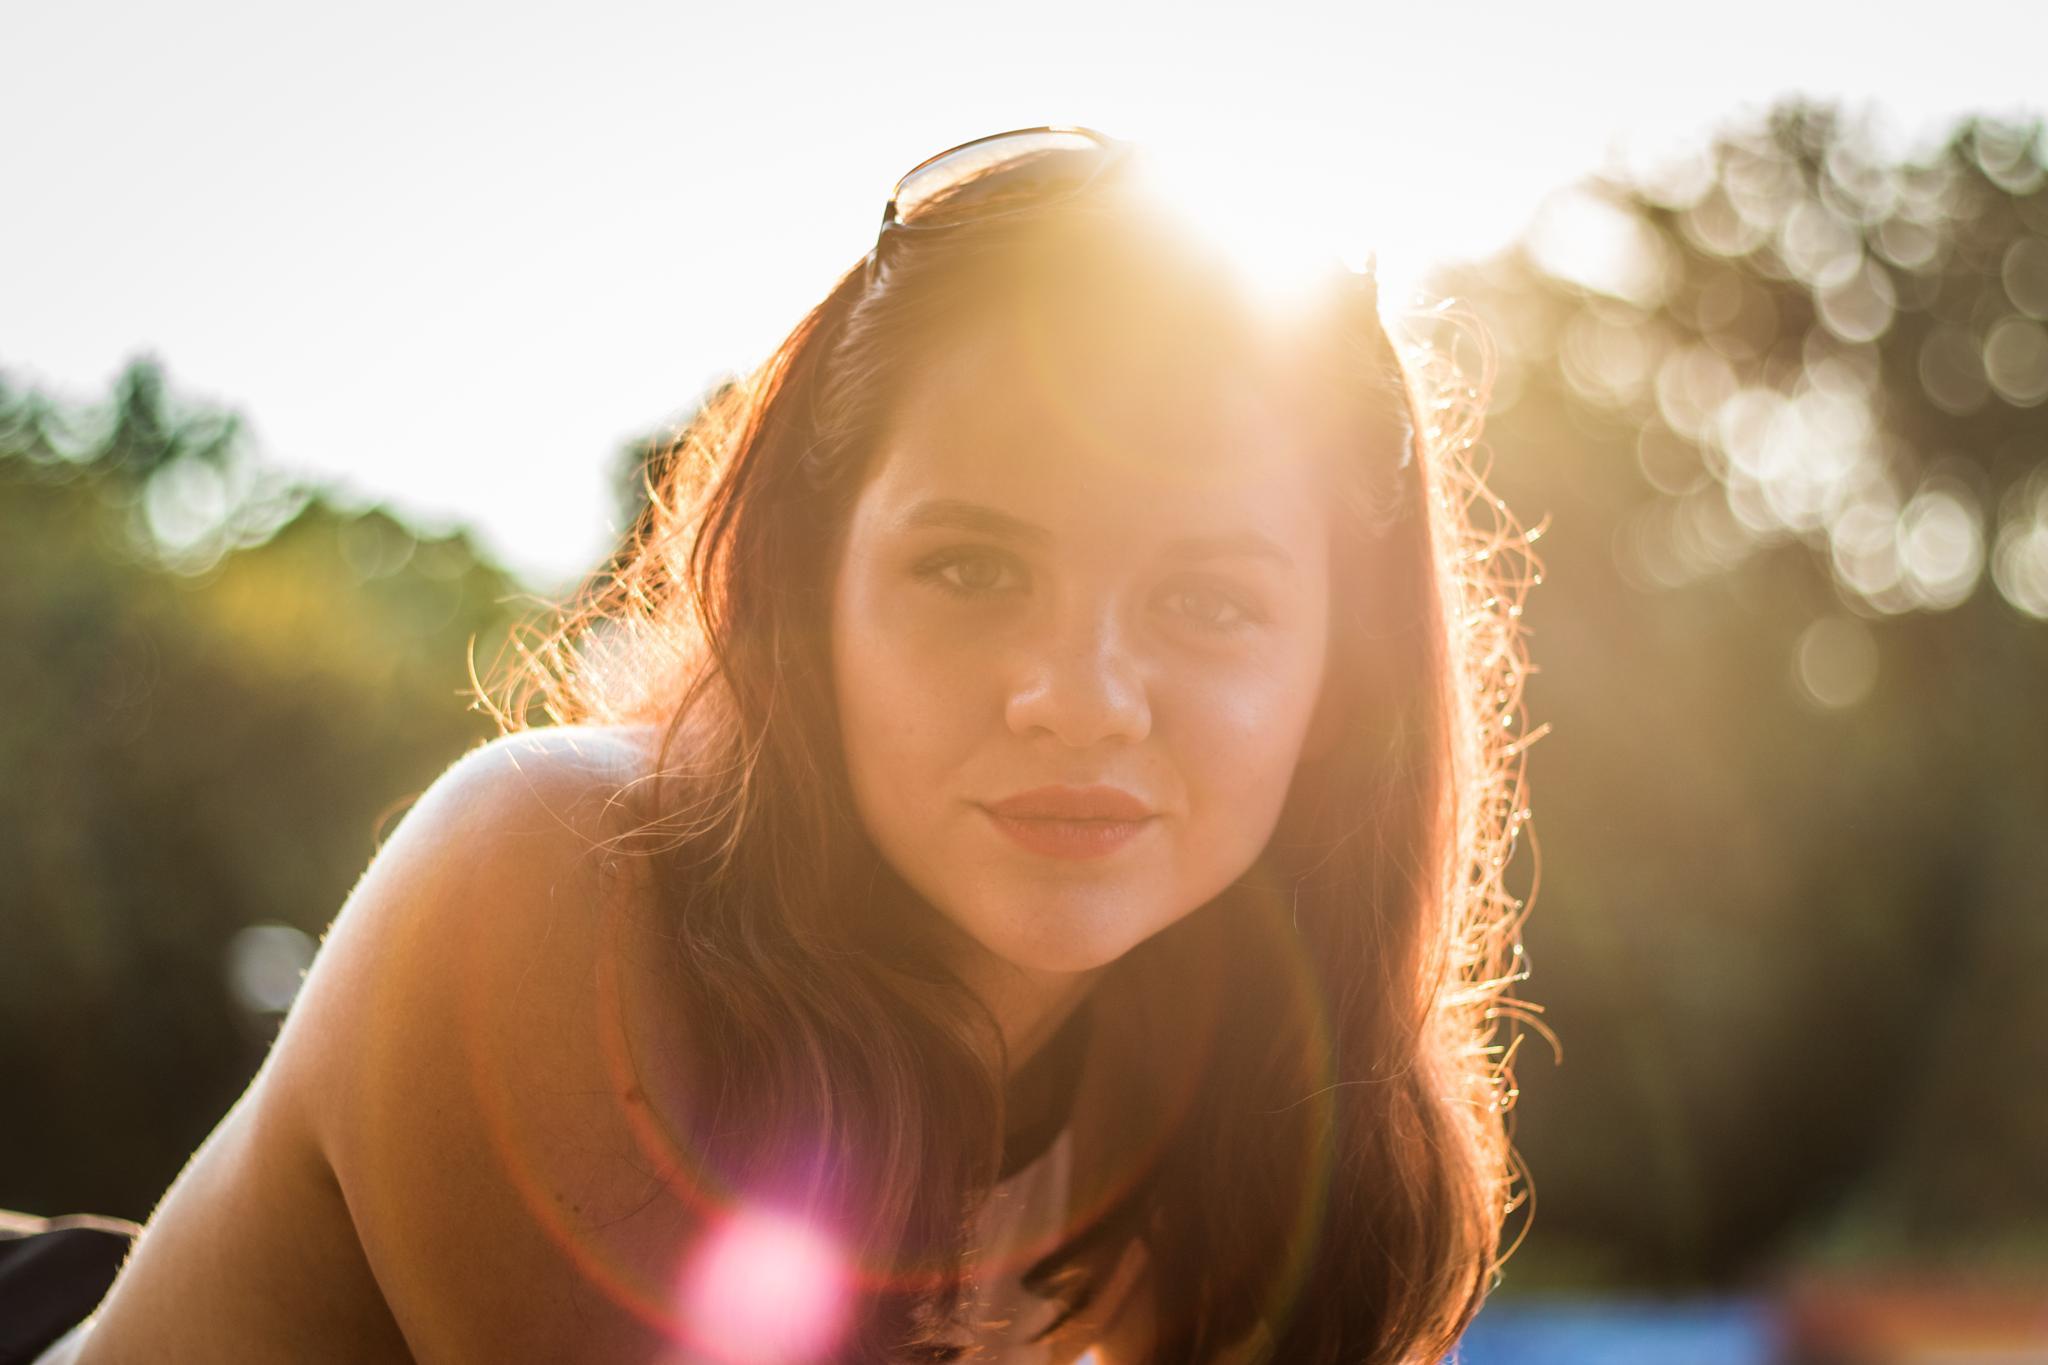 Sunny Girl by fleosphoto